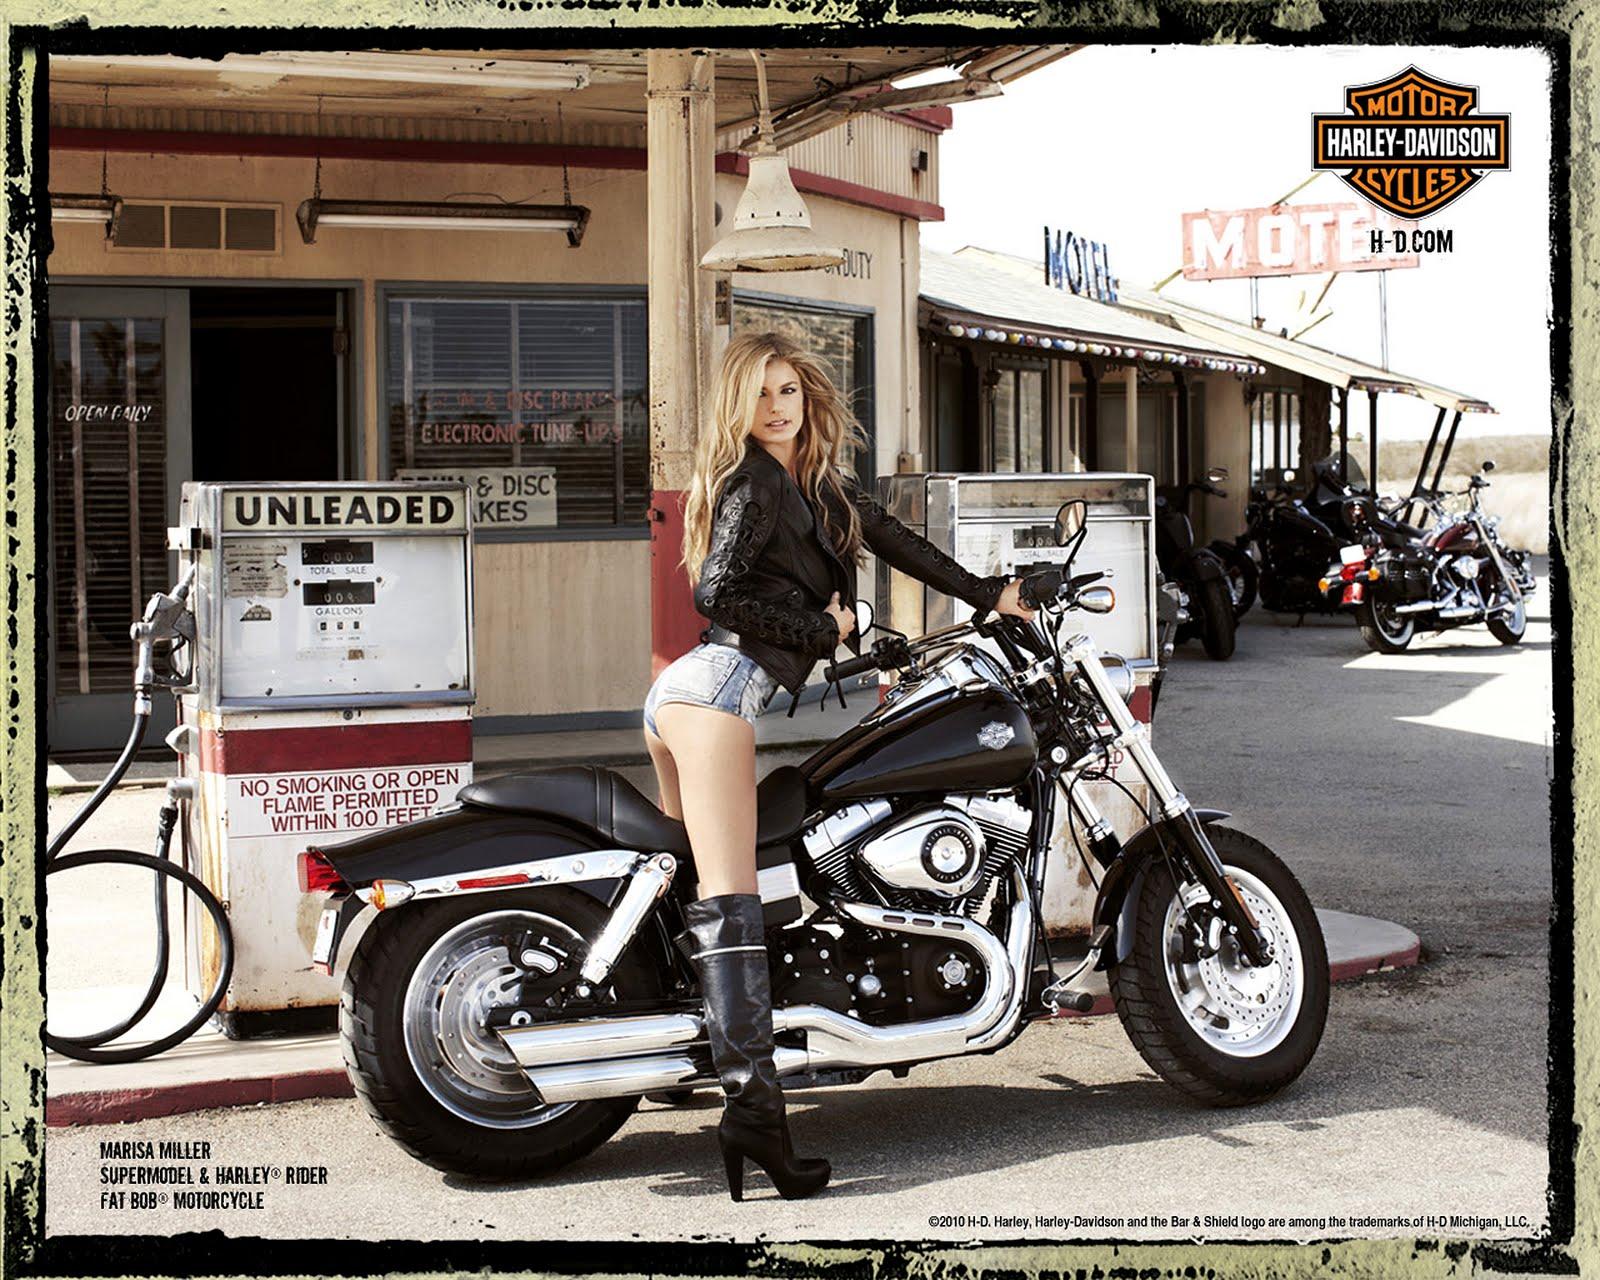 http://2.bp.blogspot.com/_oKFBOxM637A/S-n9wKFmwdI/AAAAAAAANrM/AWjNTpiw3s0/s1600/marisa-miller-biker-06.jpg